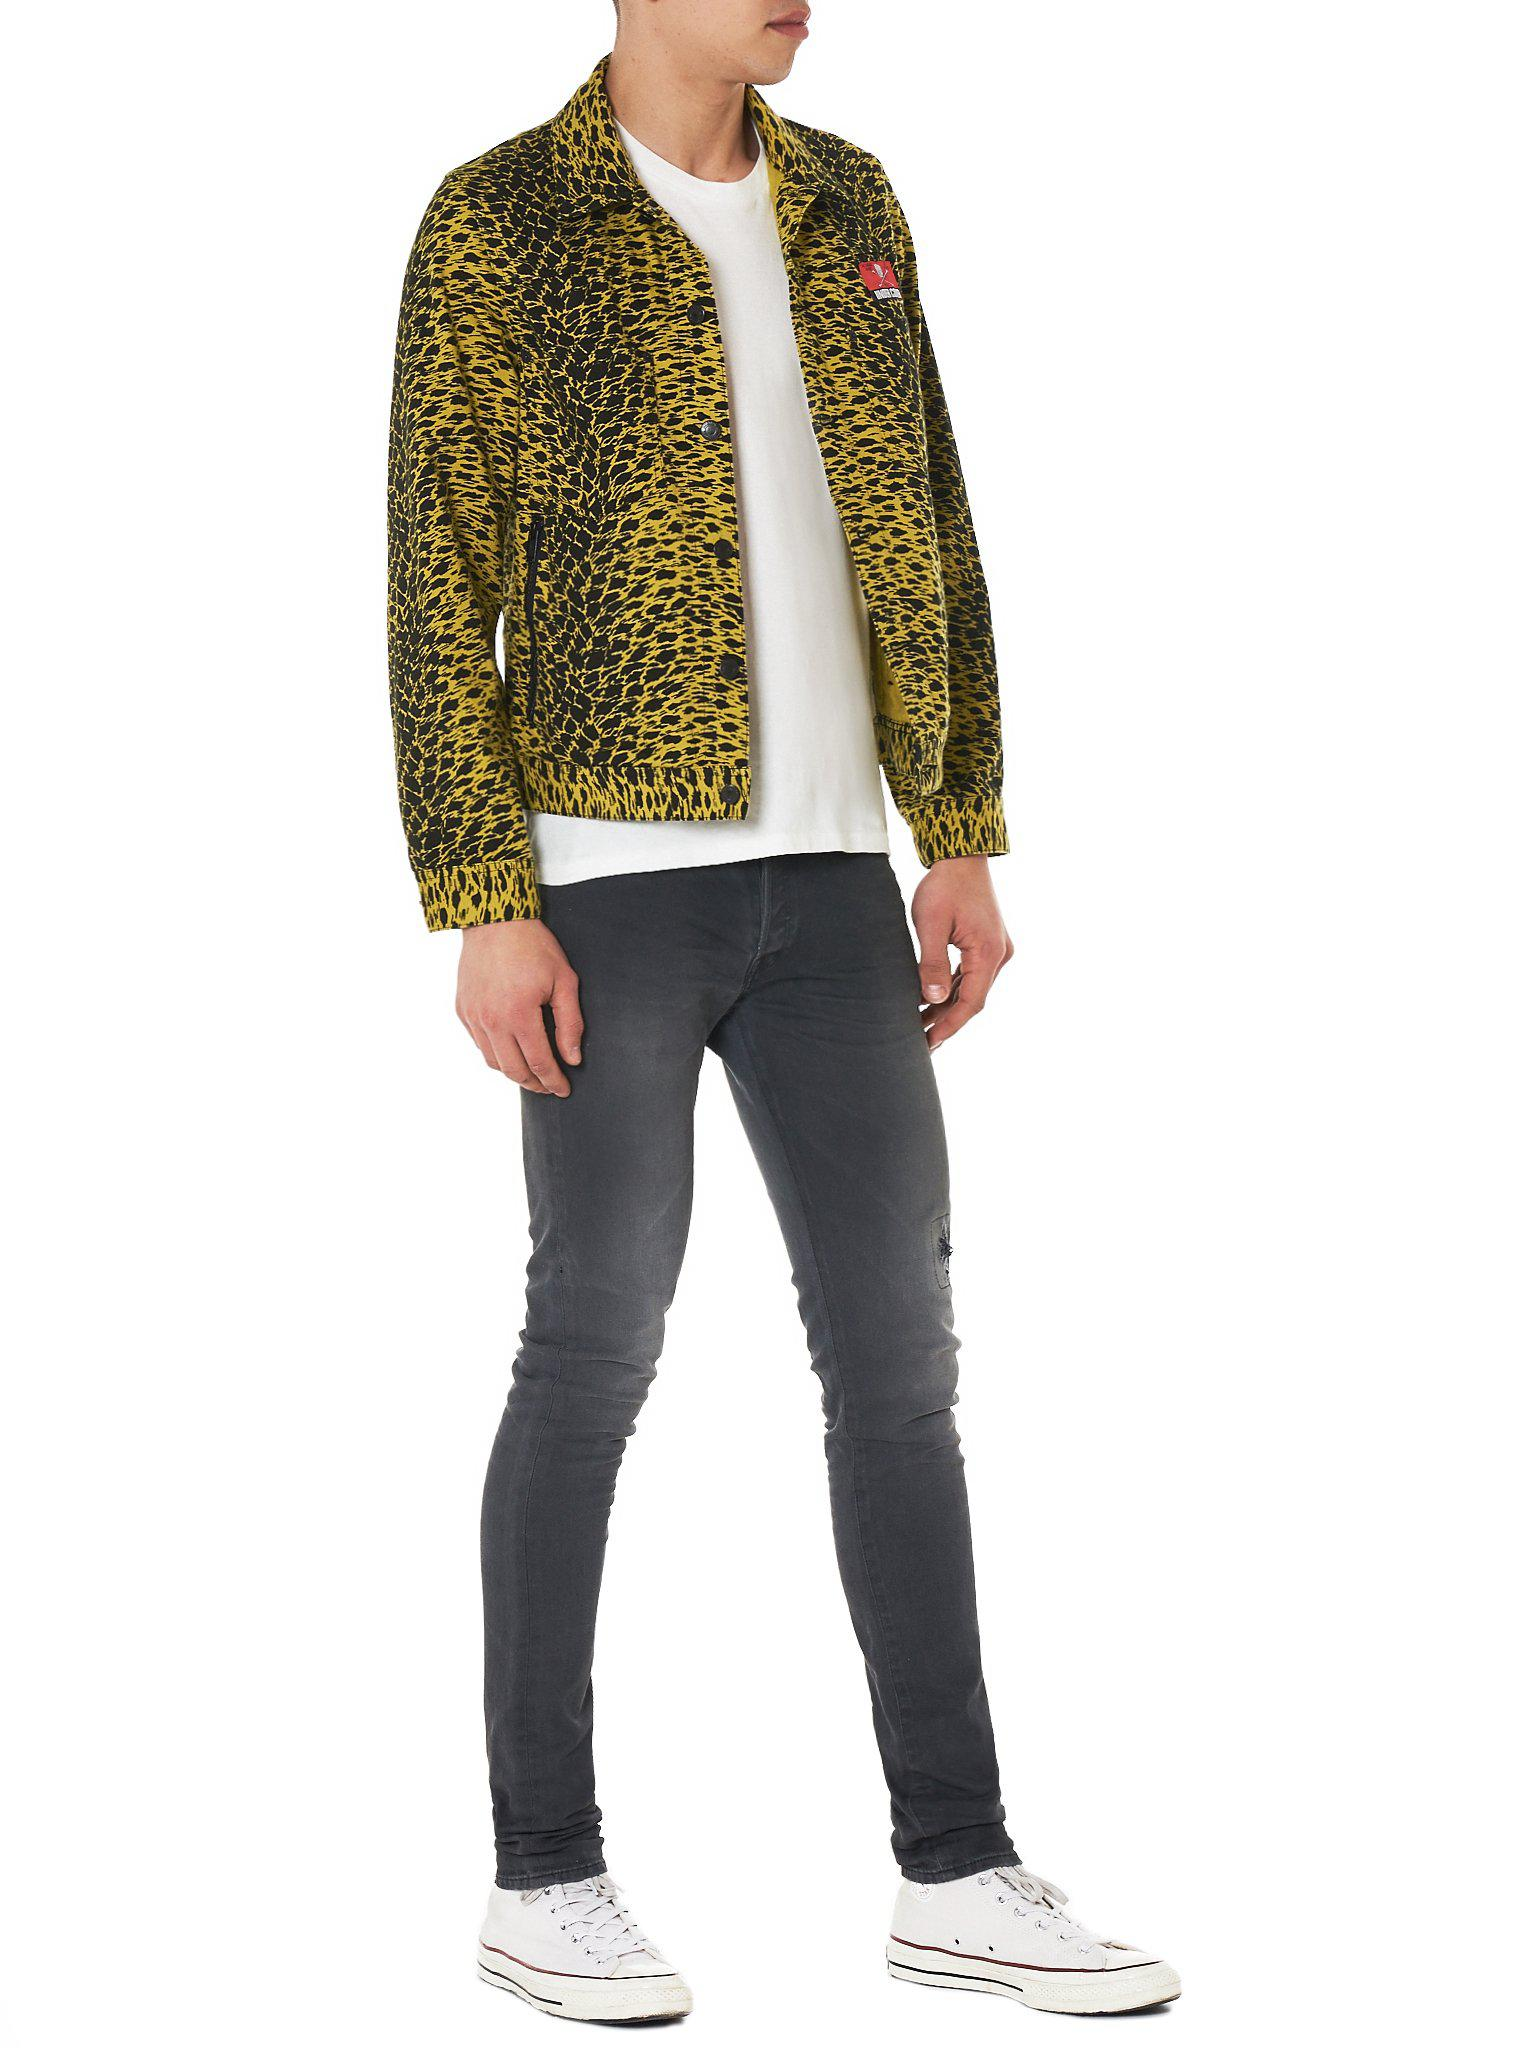 bc5b9716f3f9 Undercover 'cream Soda' Leopard Print Jacket for Men - Lyst